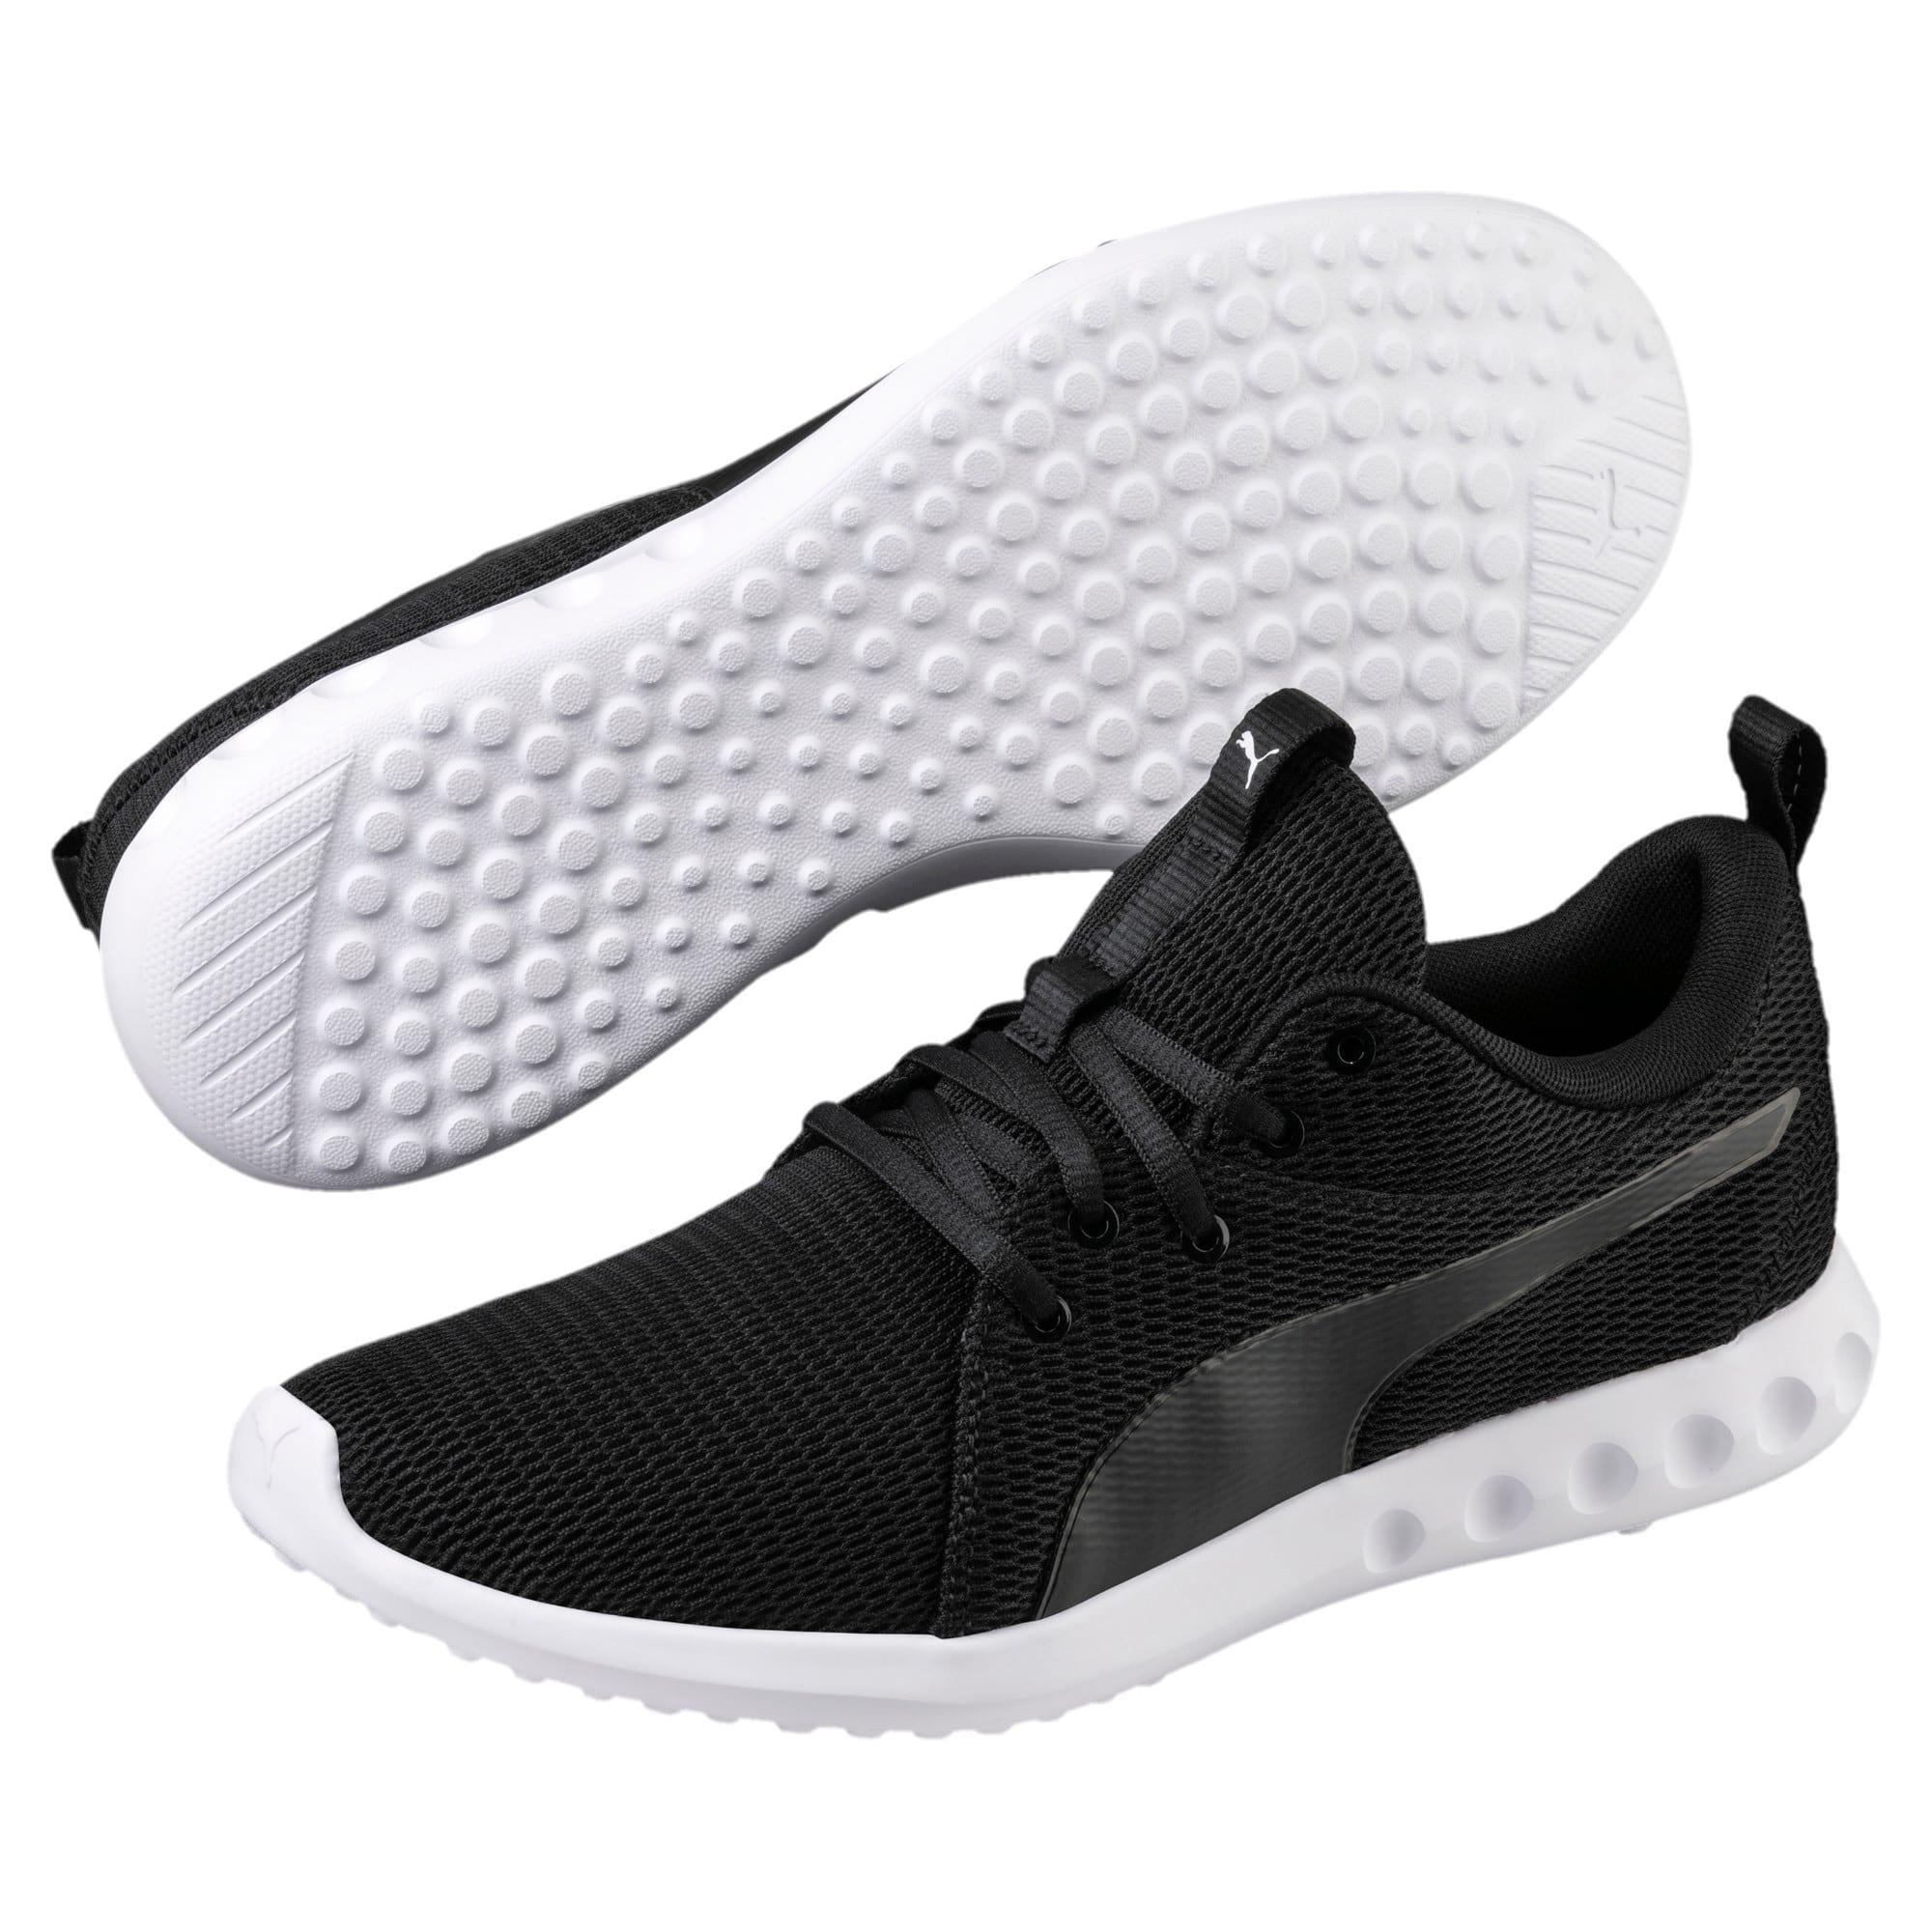 Miniatura 2 de Zapatos para correrCarson 2 New Corepara hombre, Puma Black-Puma White, mediano